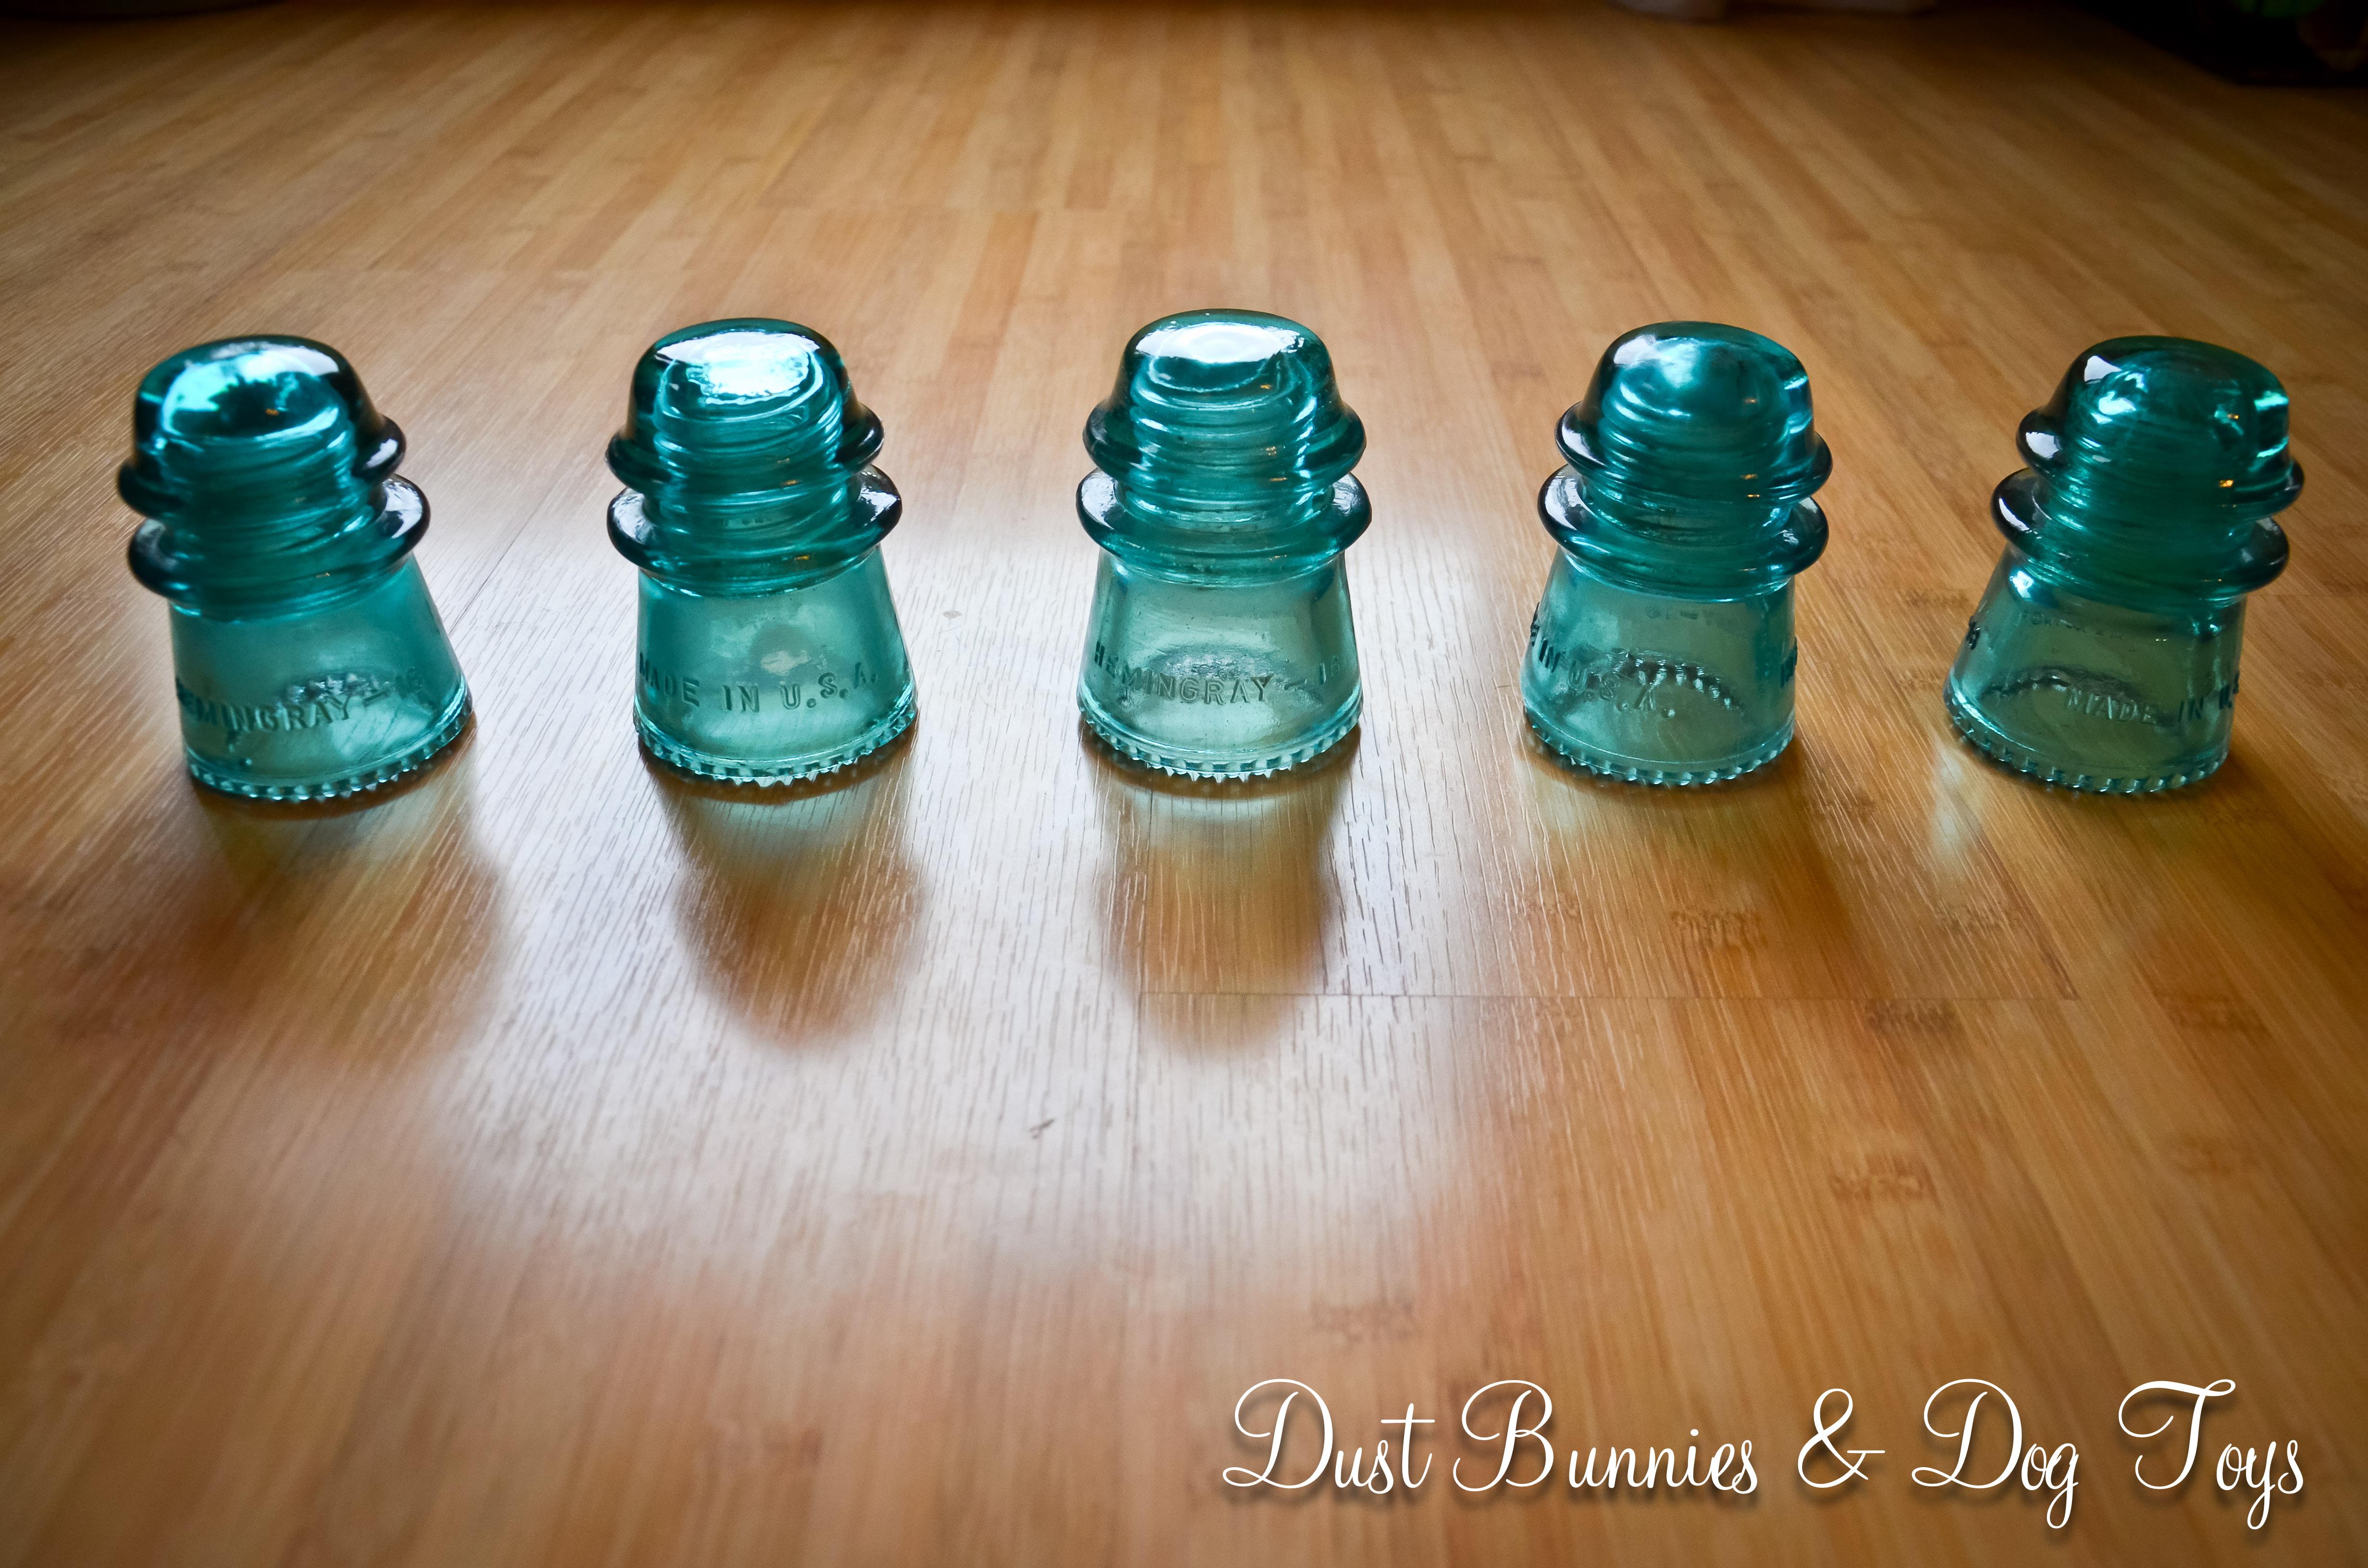 Diy glass insulator pendant lights dust bunnies and dog toys option1 arubaitofo Choice Image